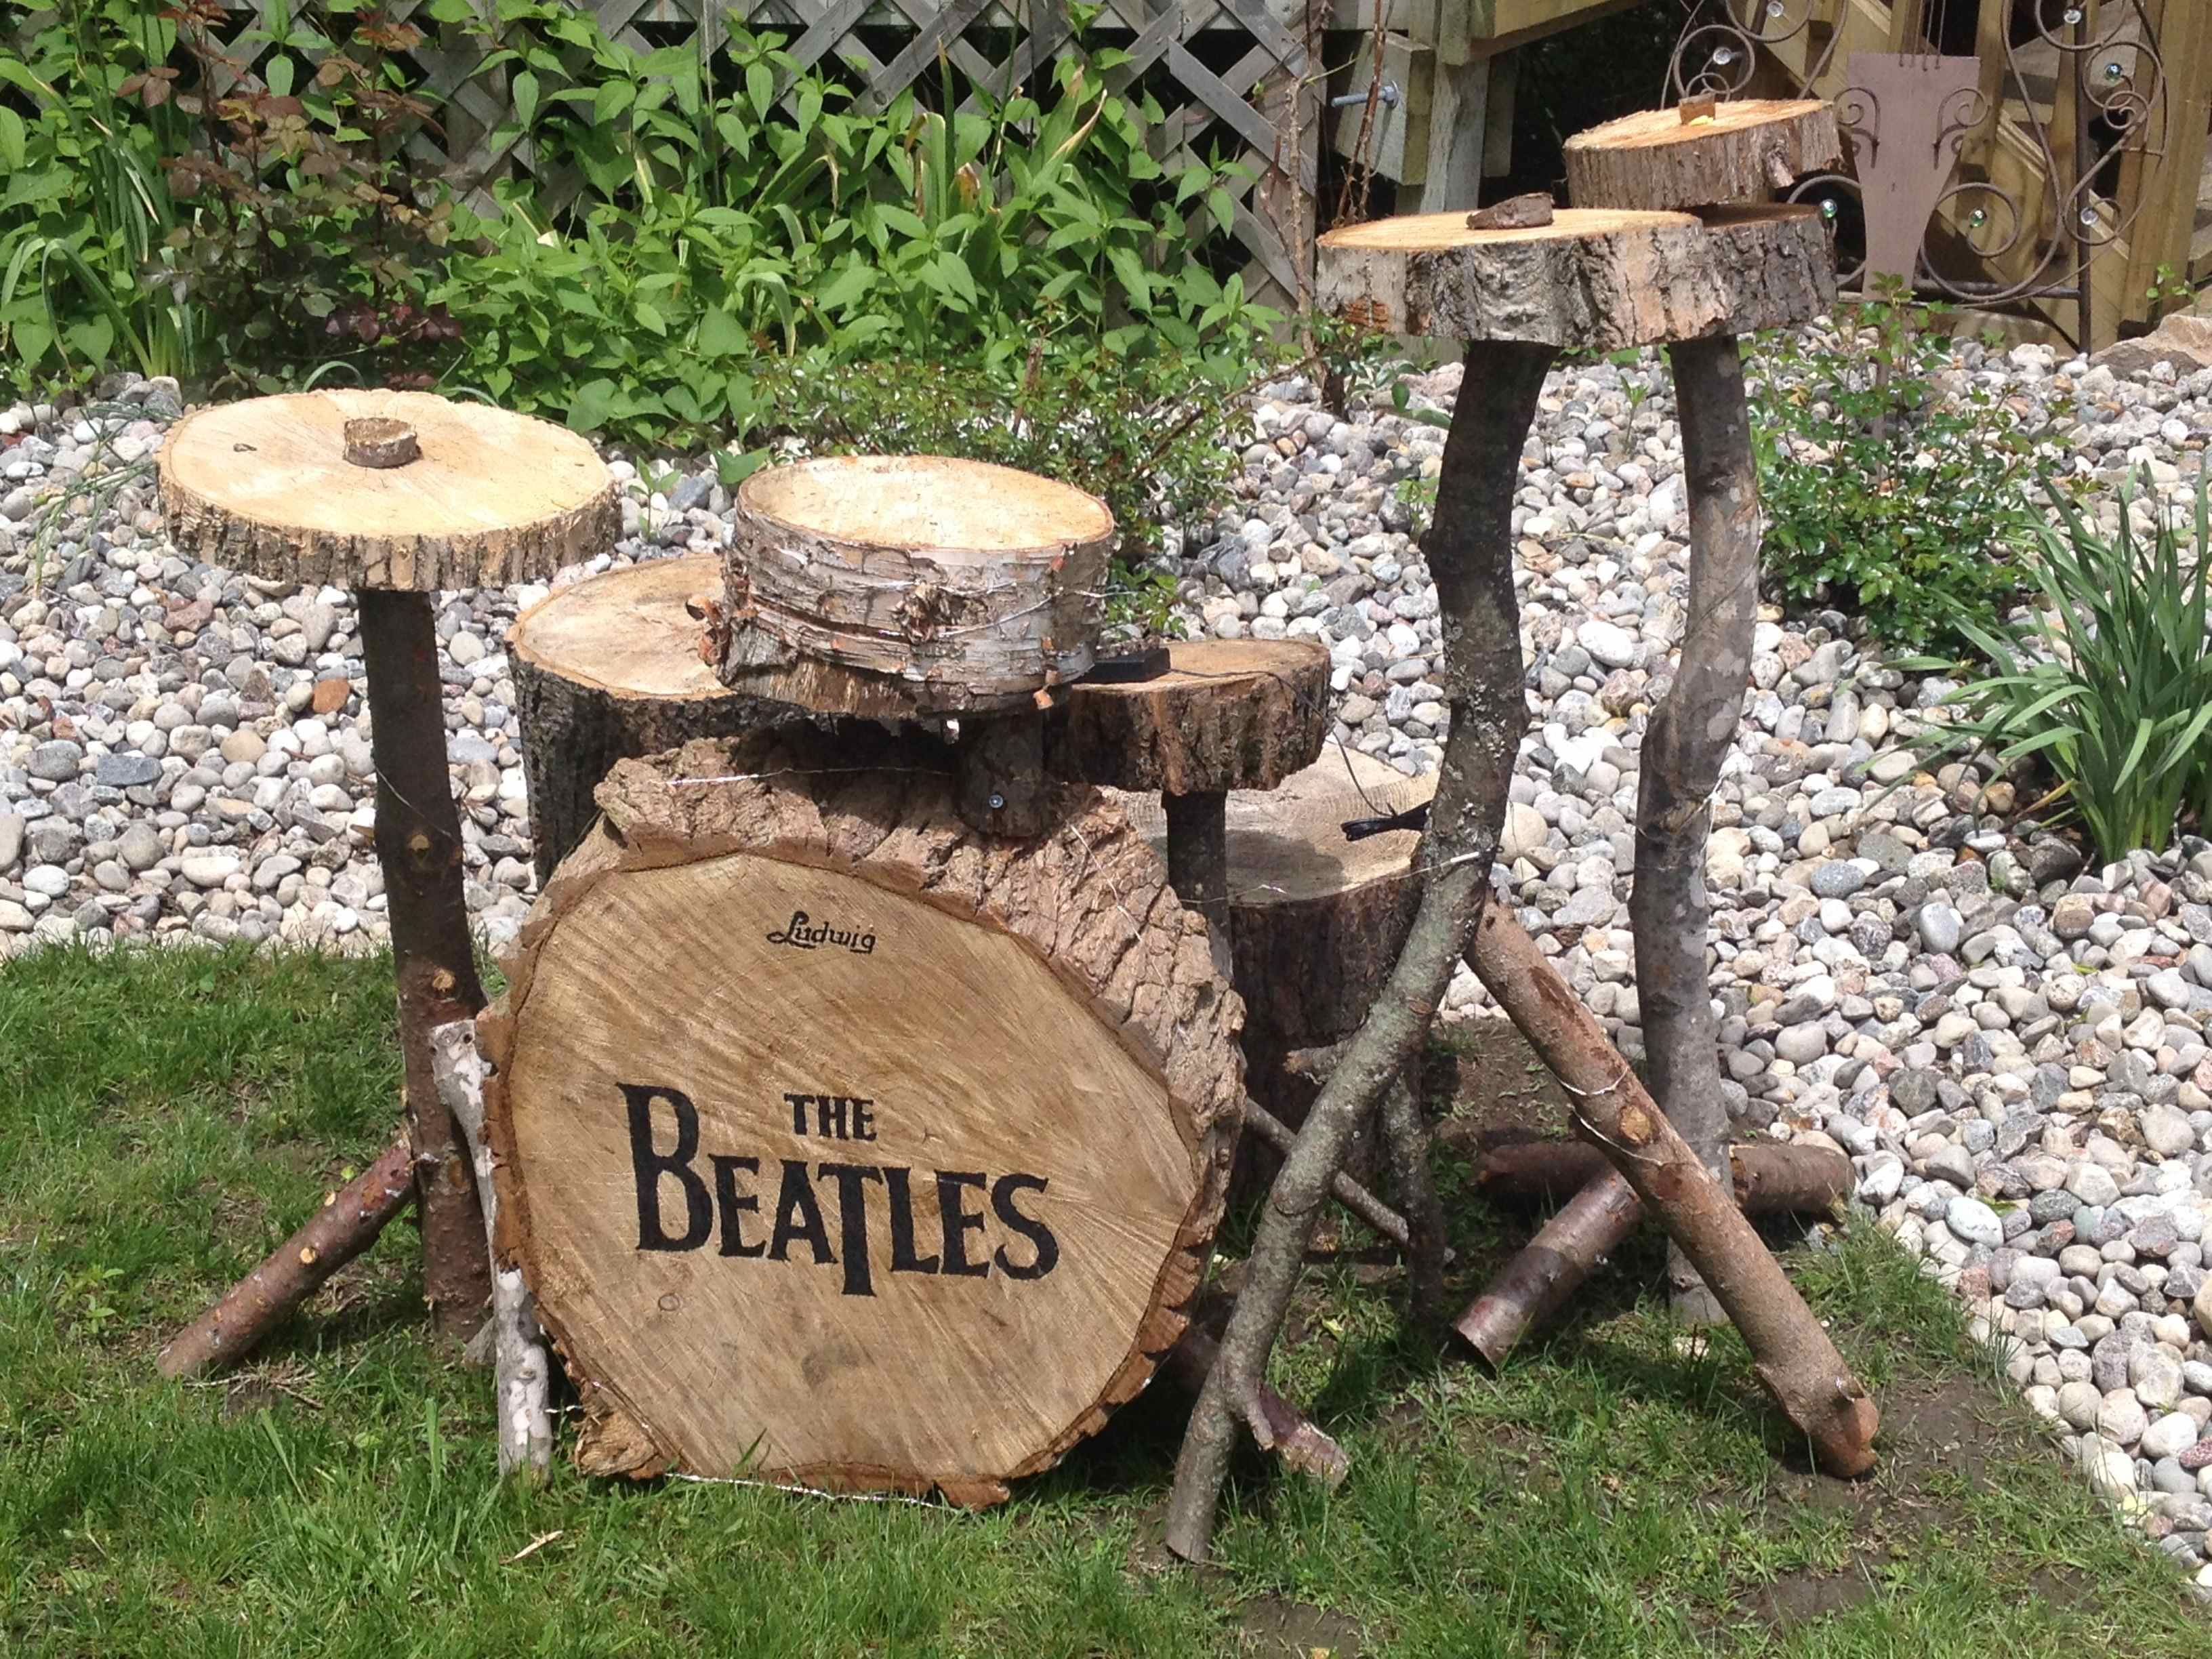 how to make a drum set